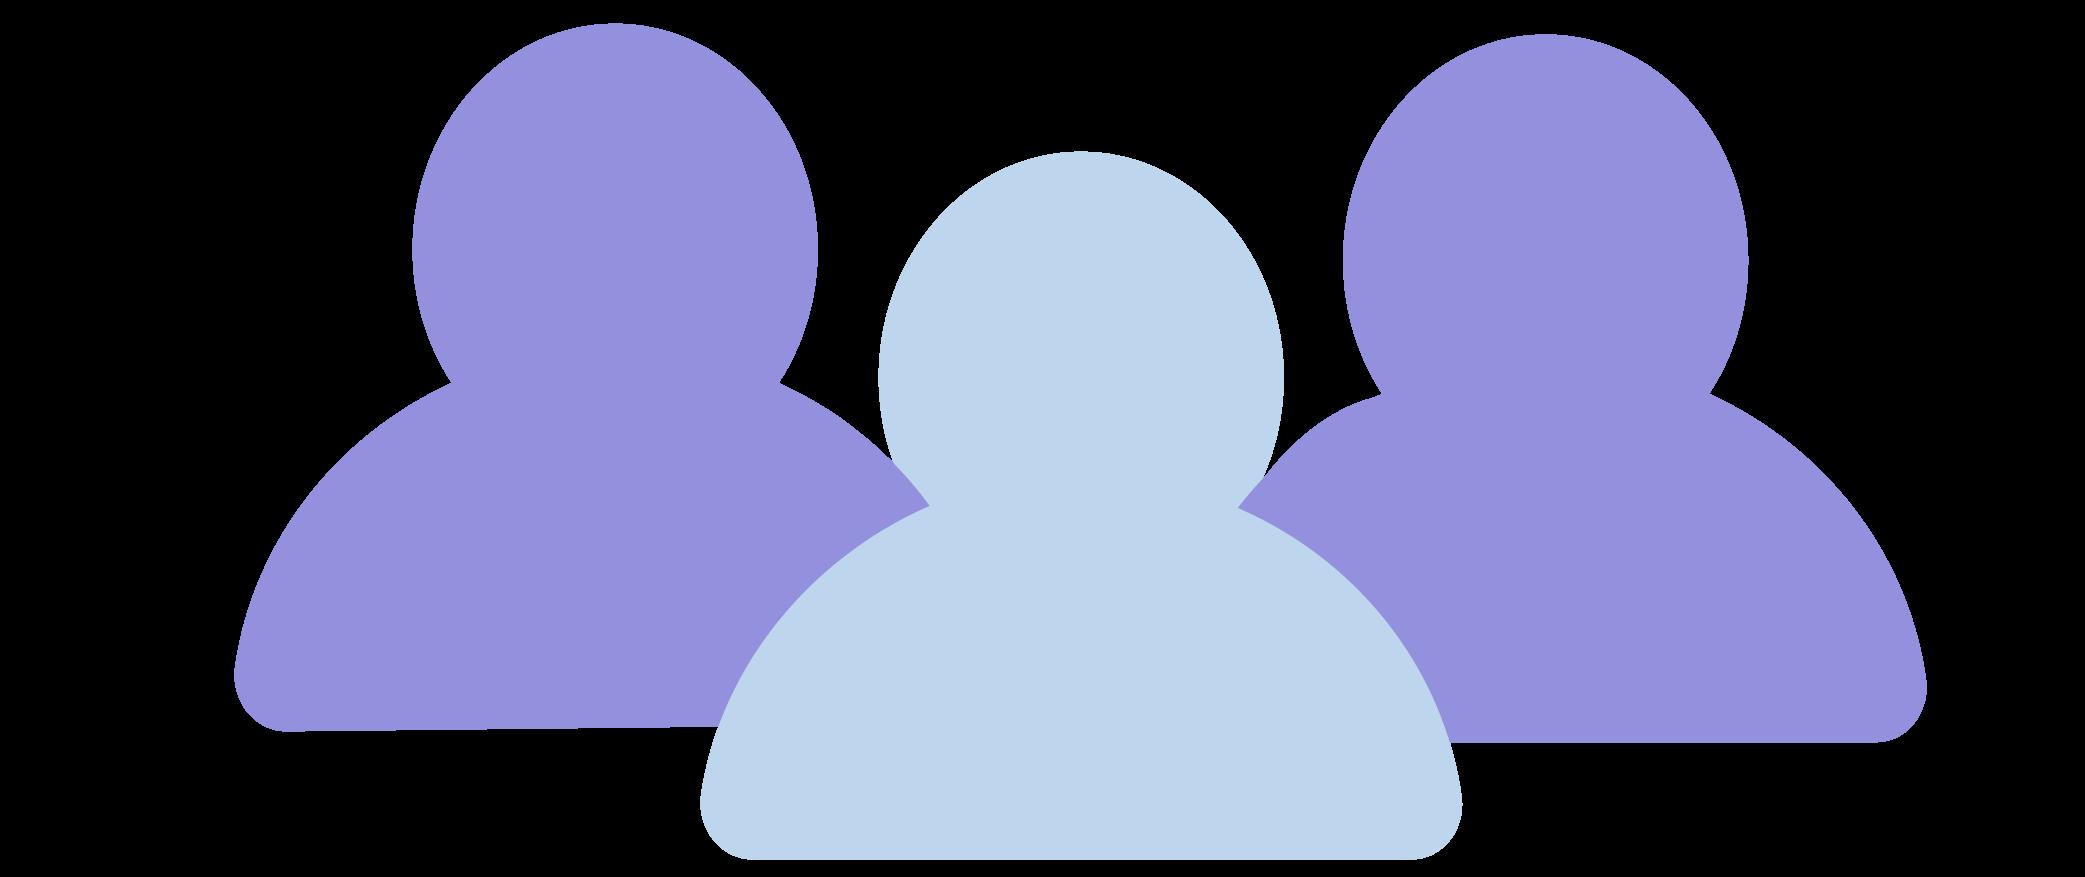 Purple team icon